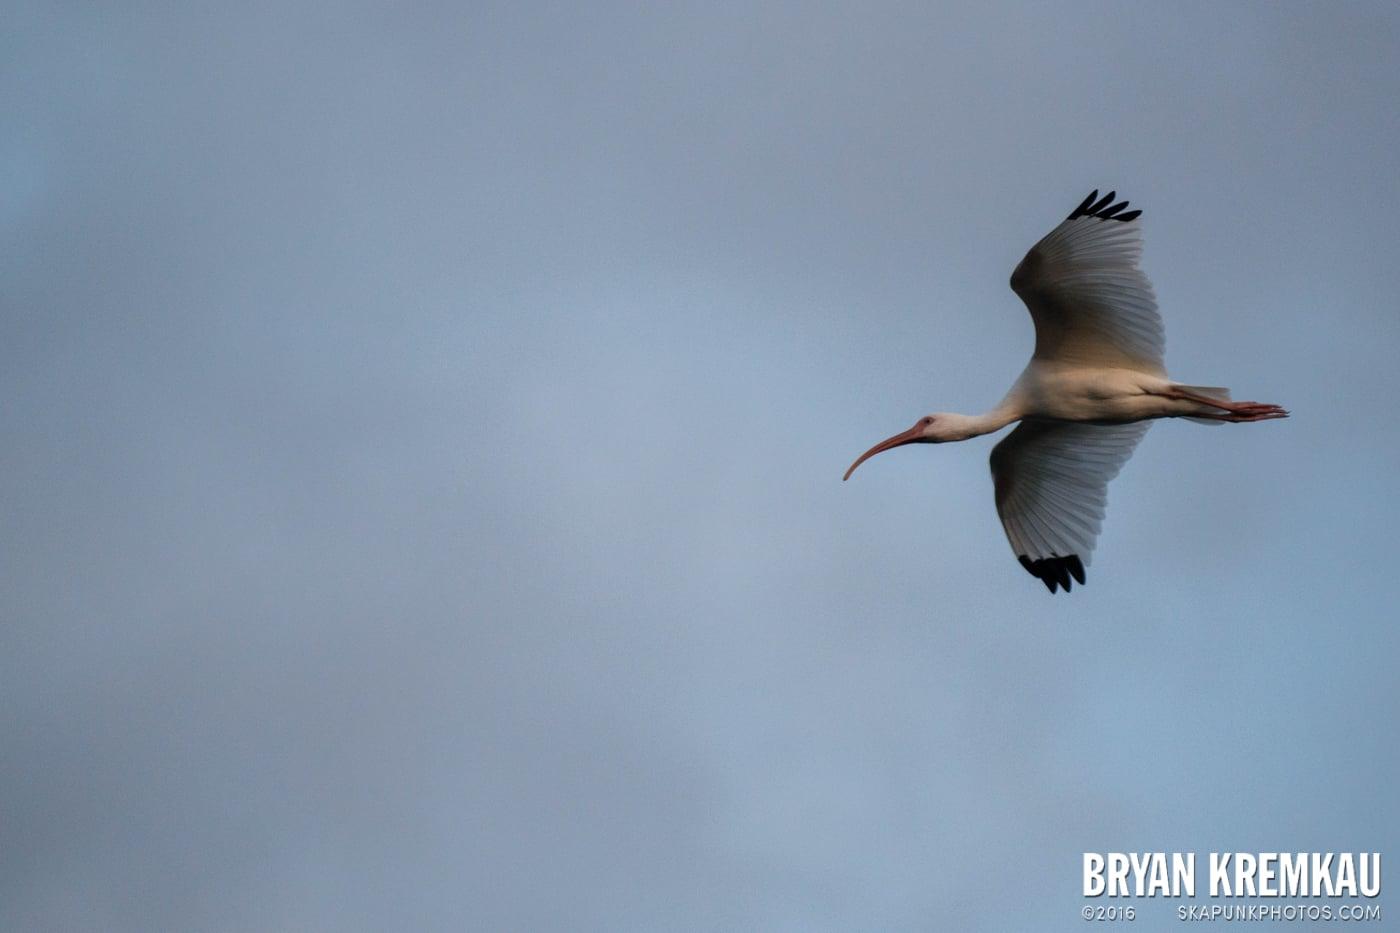 Sunsets, Astrophotography & Birds @ Venice, Florida - 10.25.14 - 11.5.14 (12)